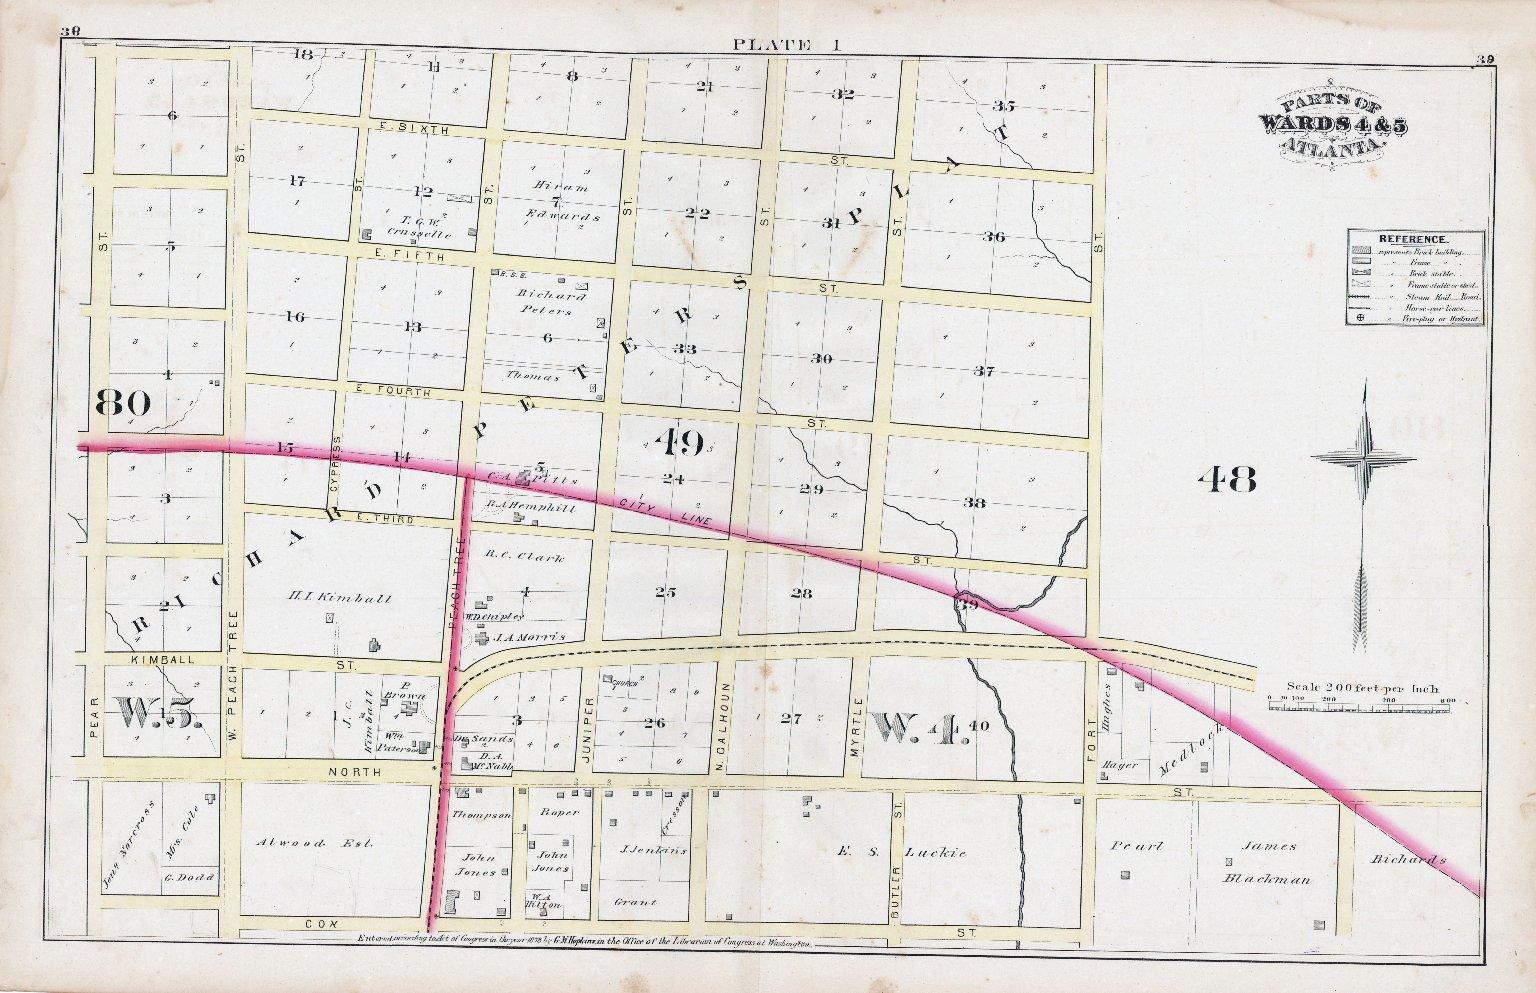 Plate I: Parts of Wards 4 & 5: Atlanta